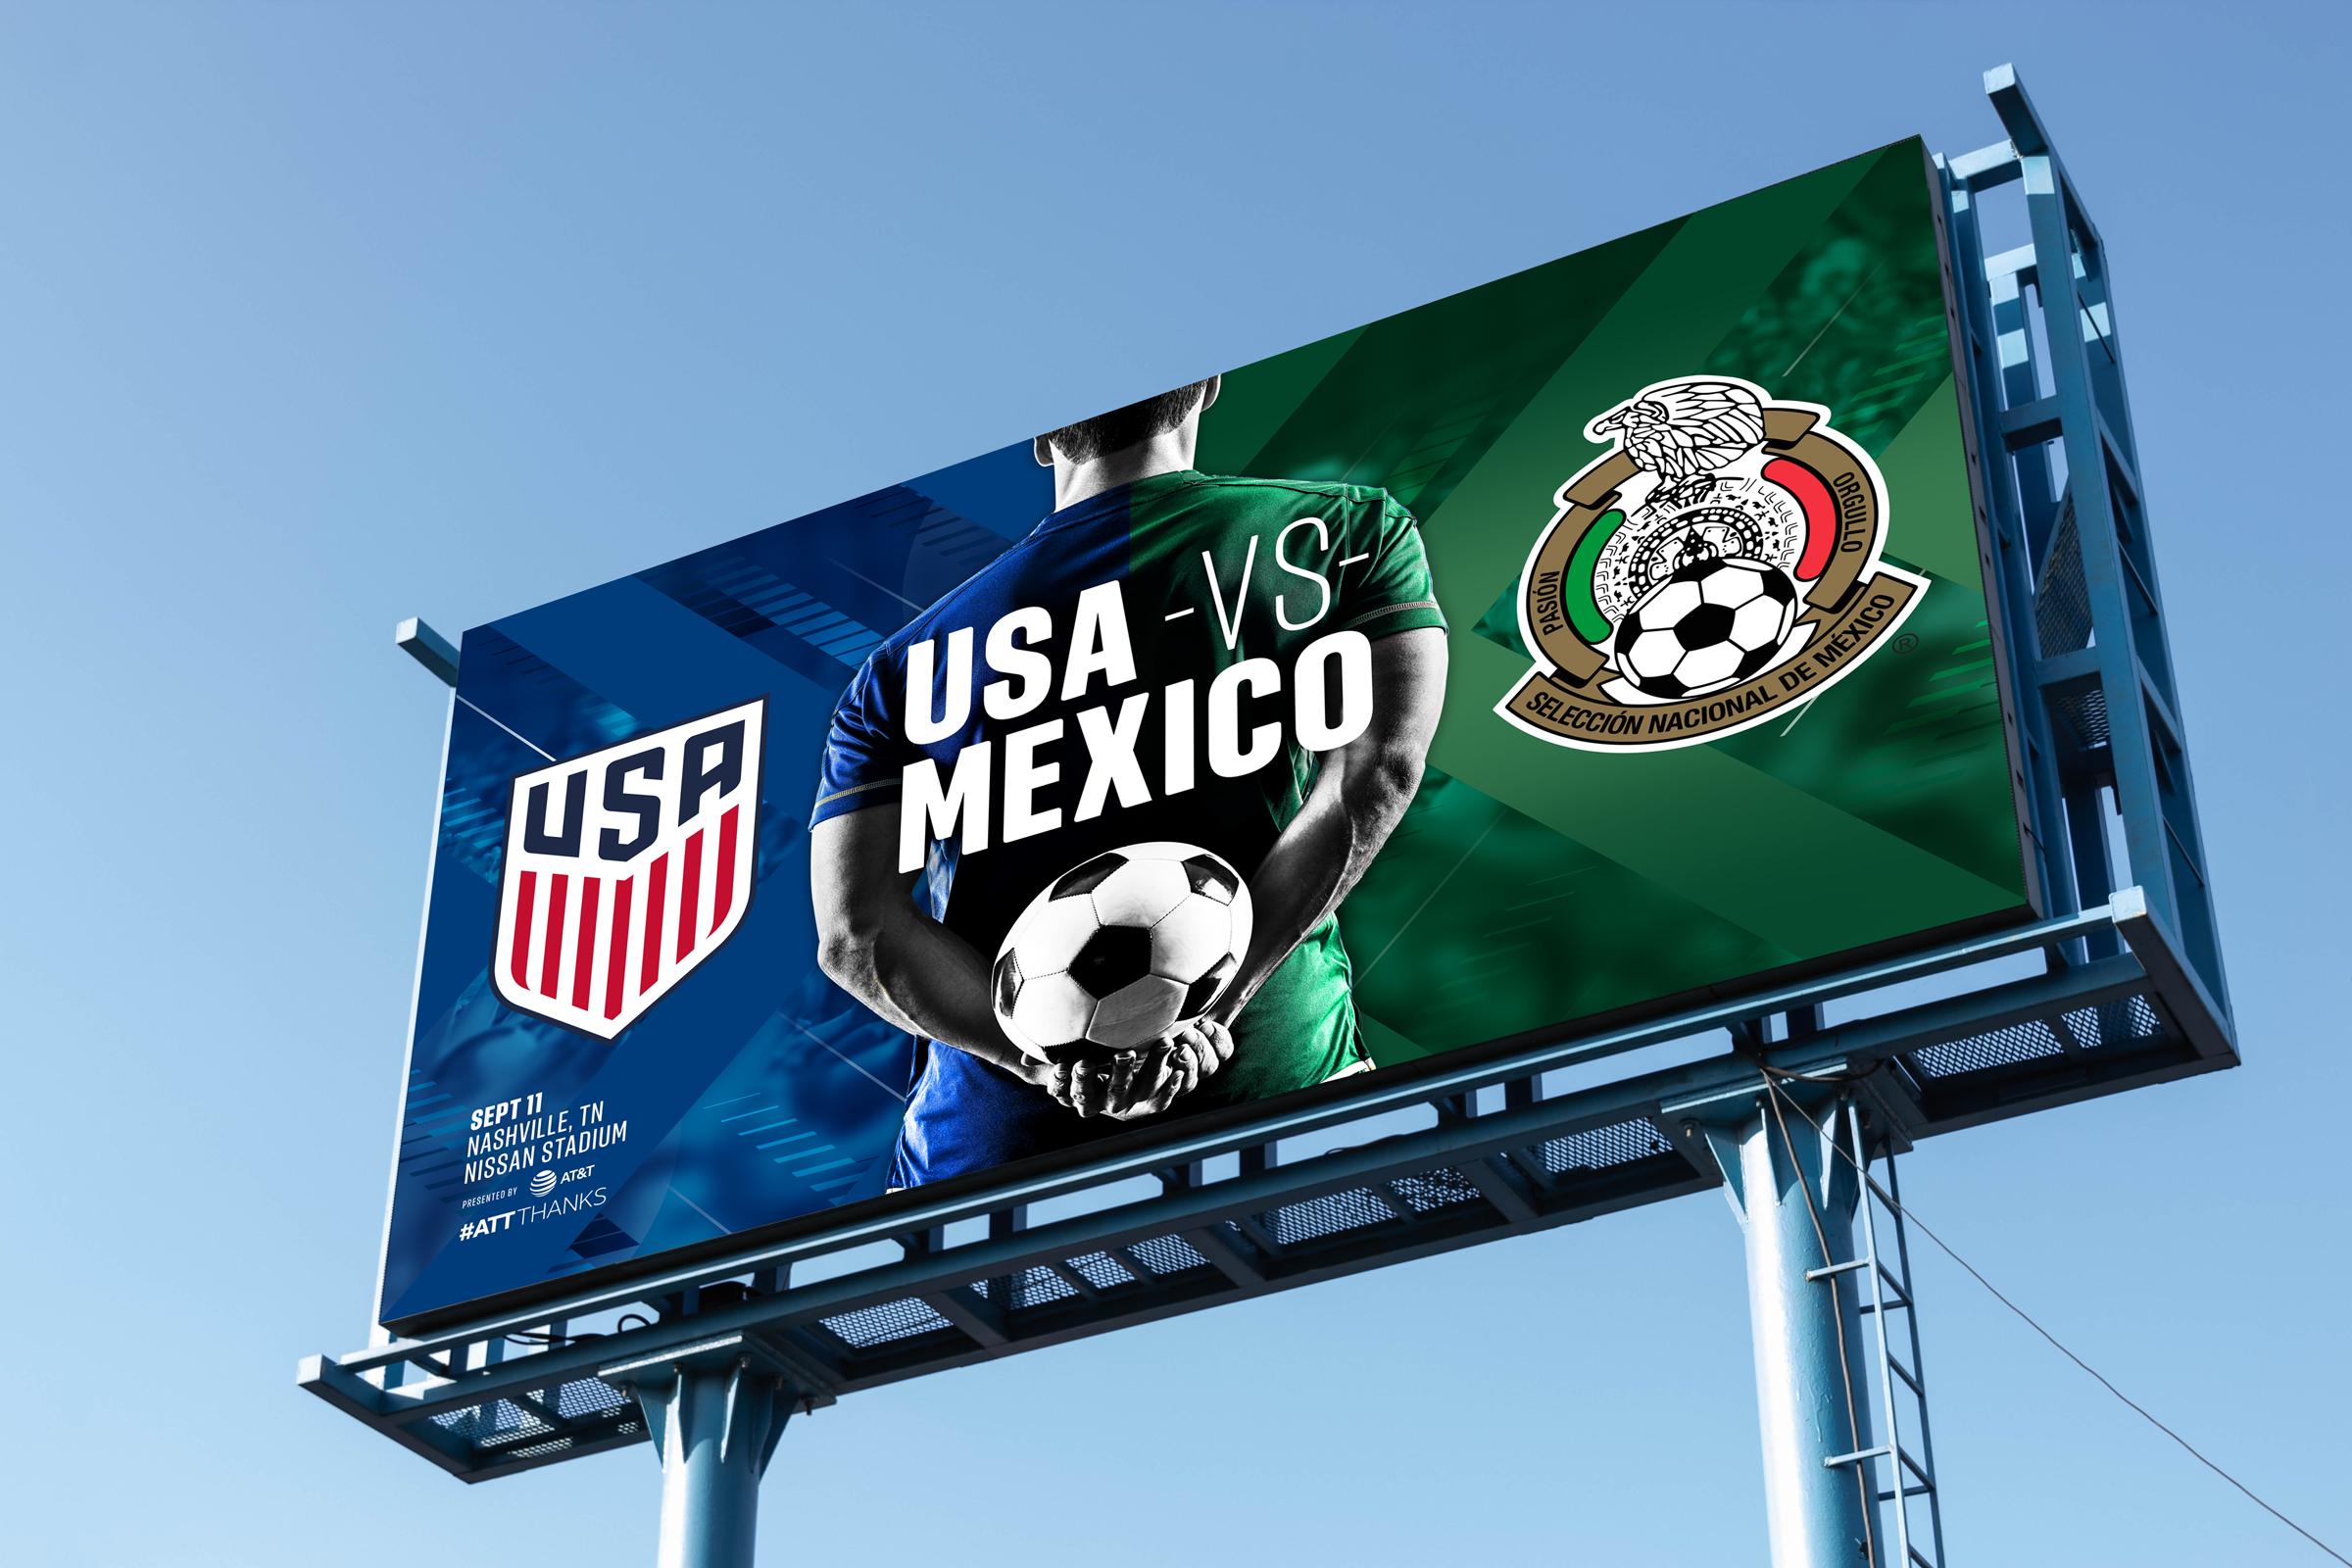 USA-vs-MEXICO_billboard.png